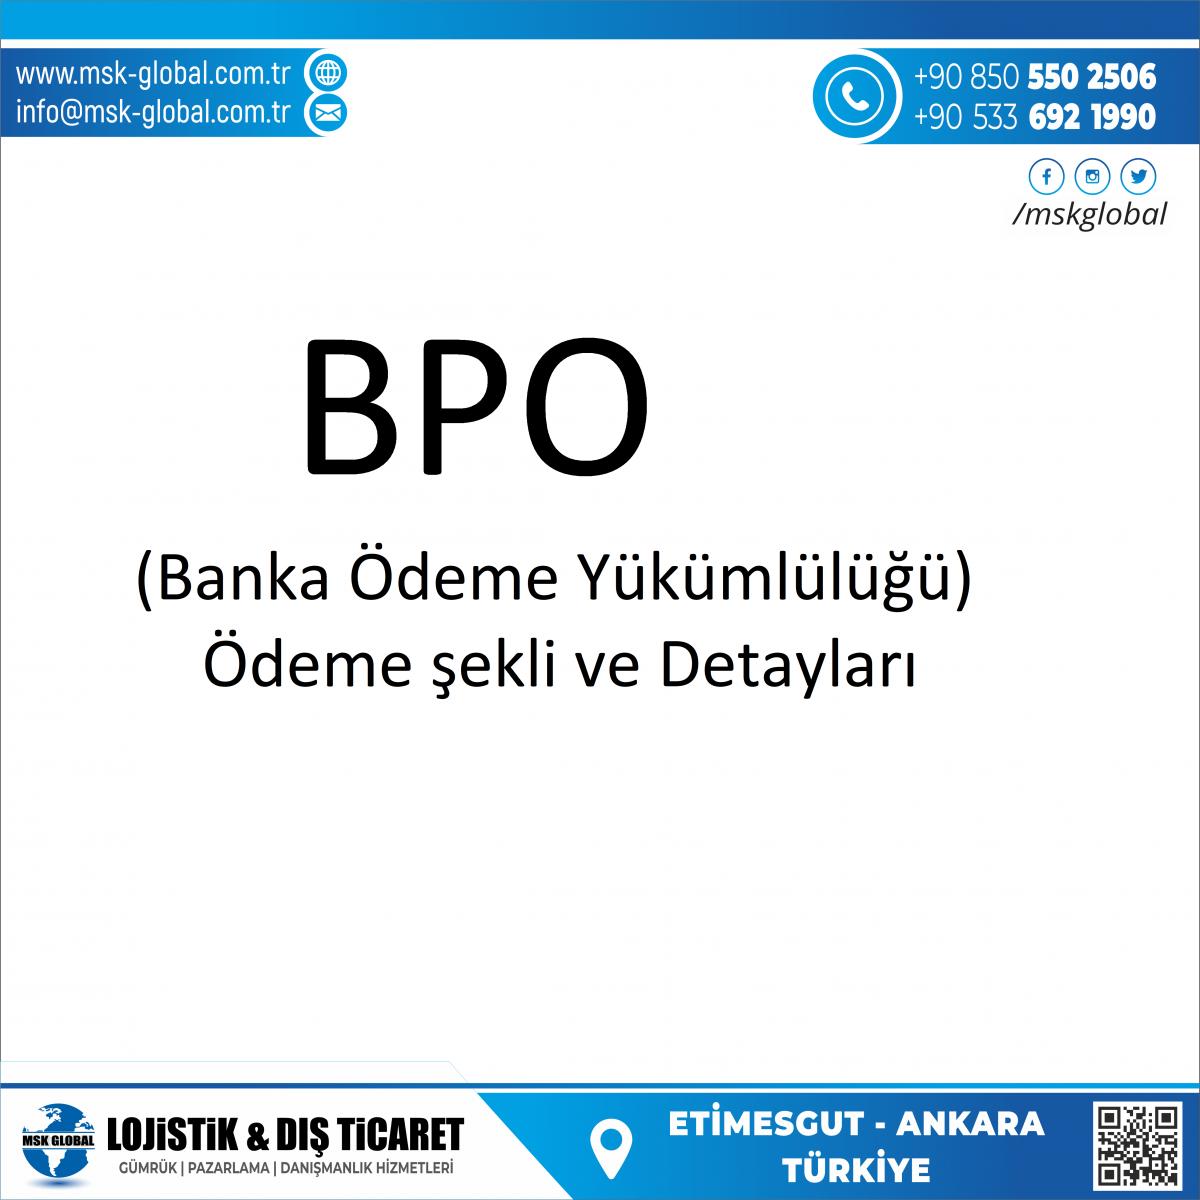 Bpo-odeme-sekli-1200x1200.png